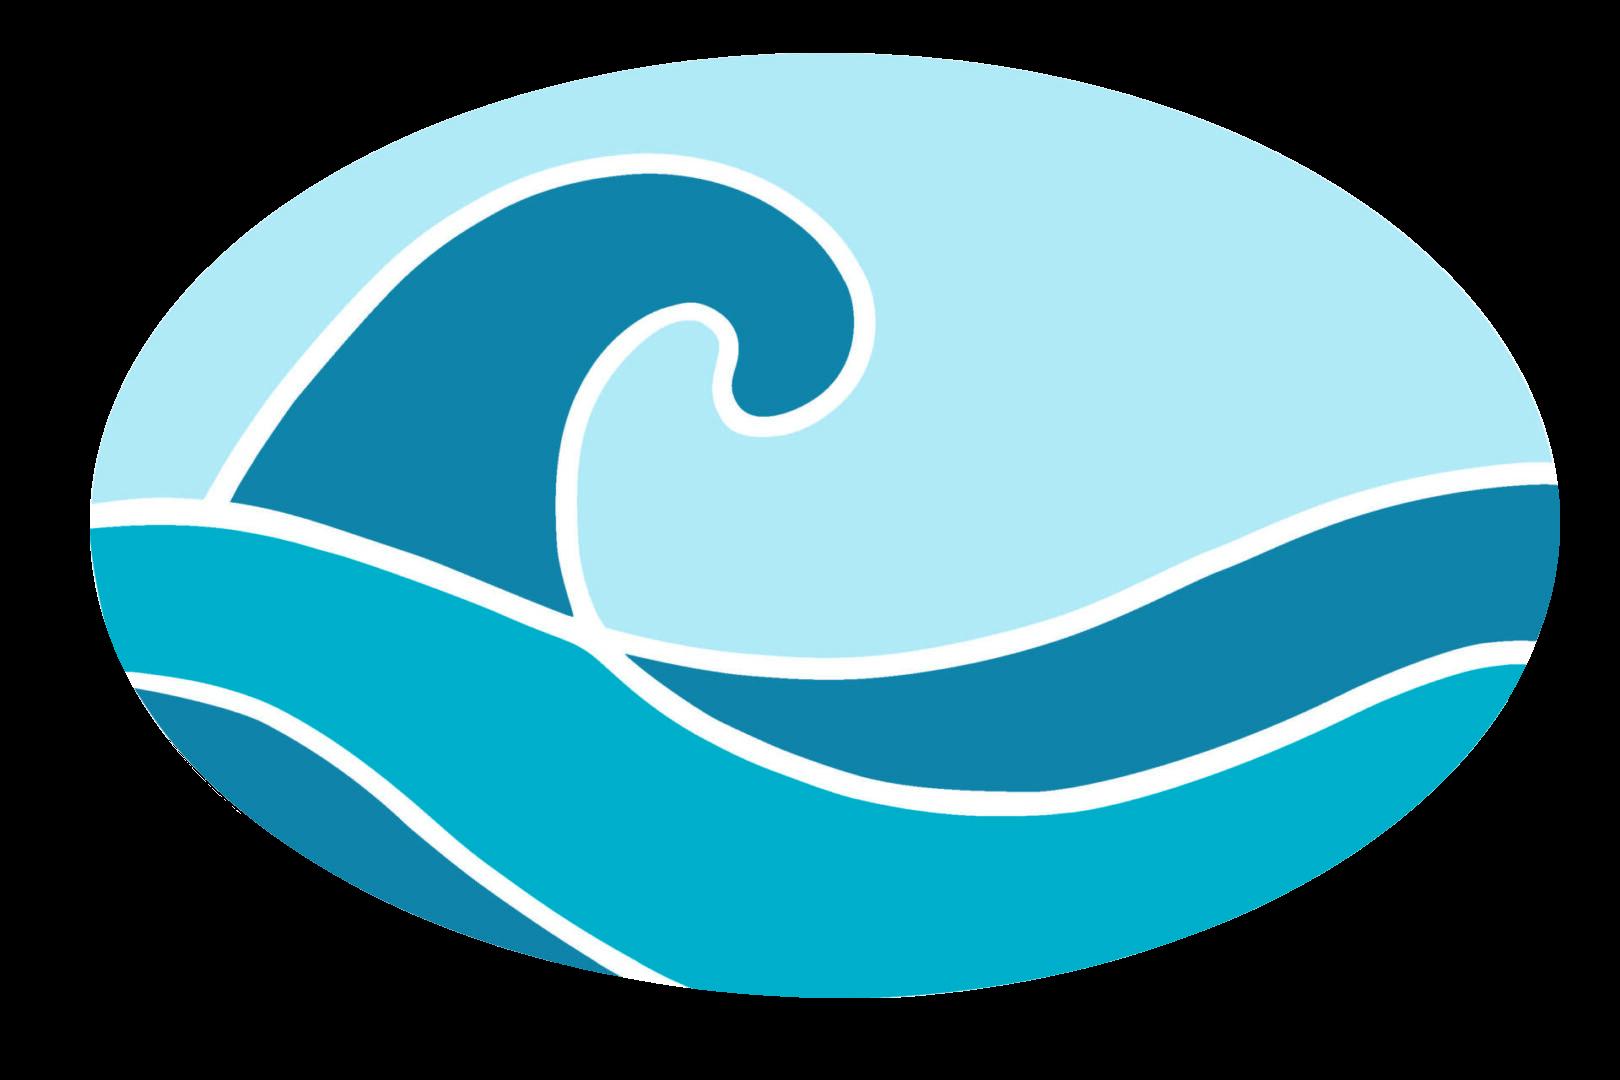 logo-icon-1-transparent bg